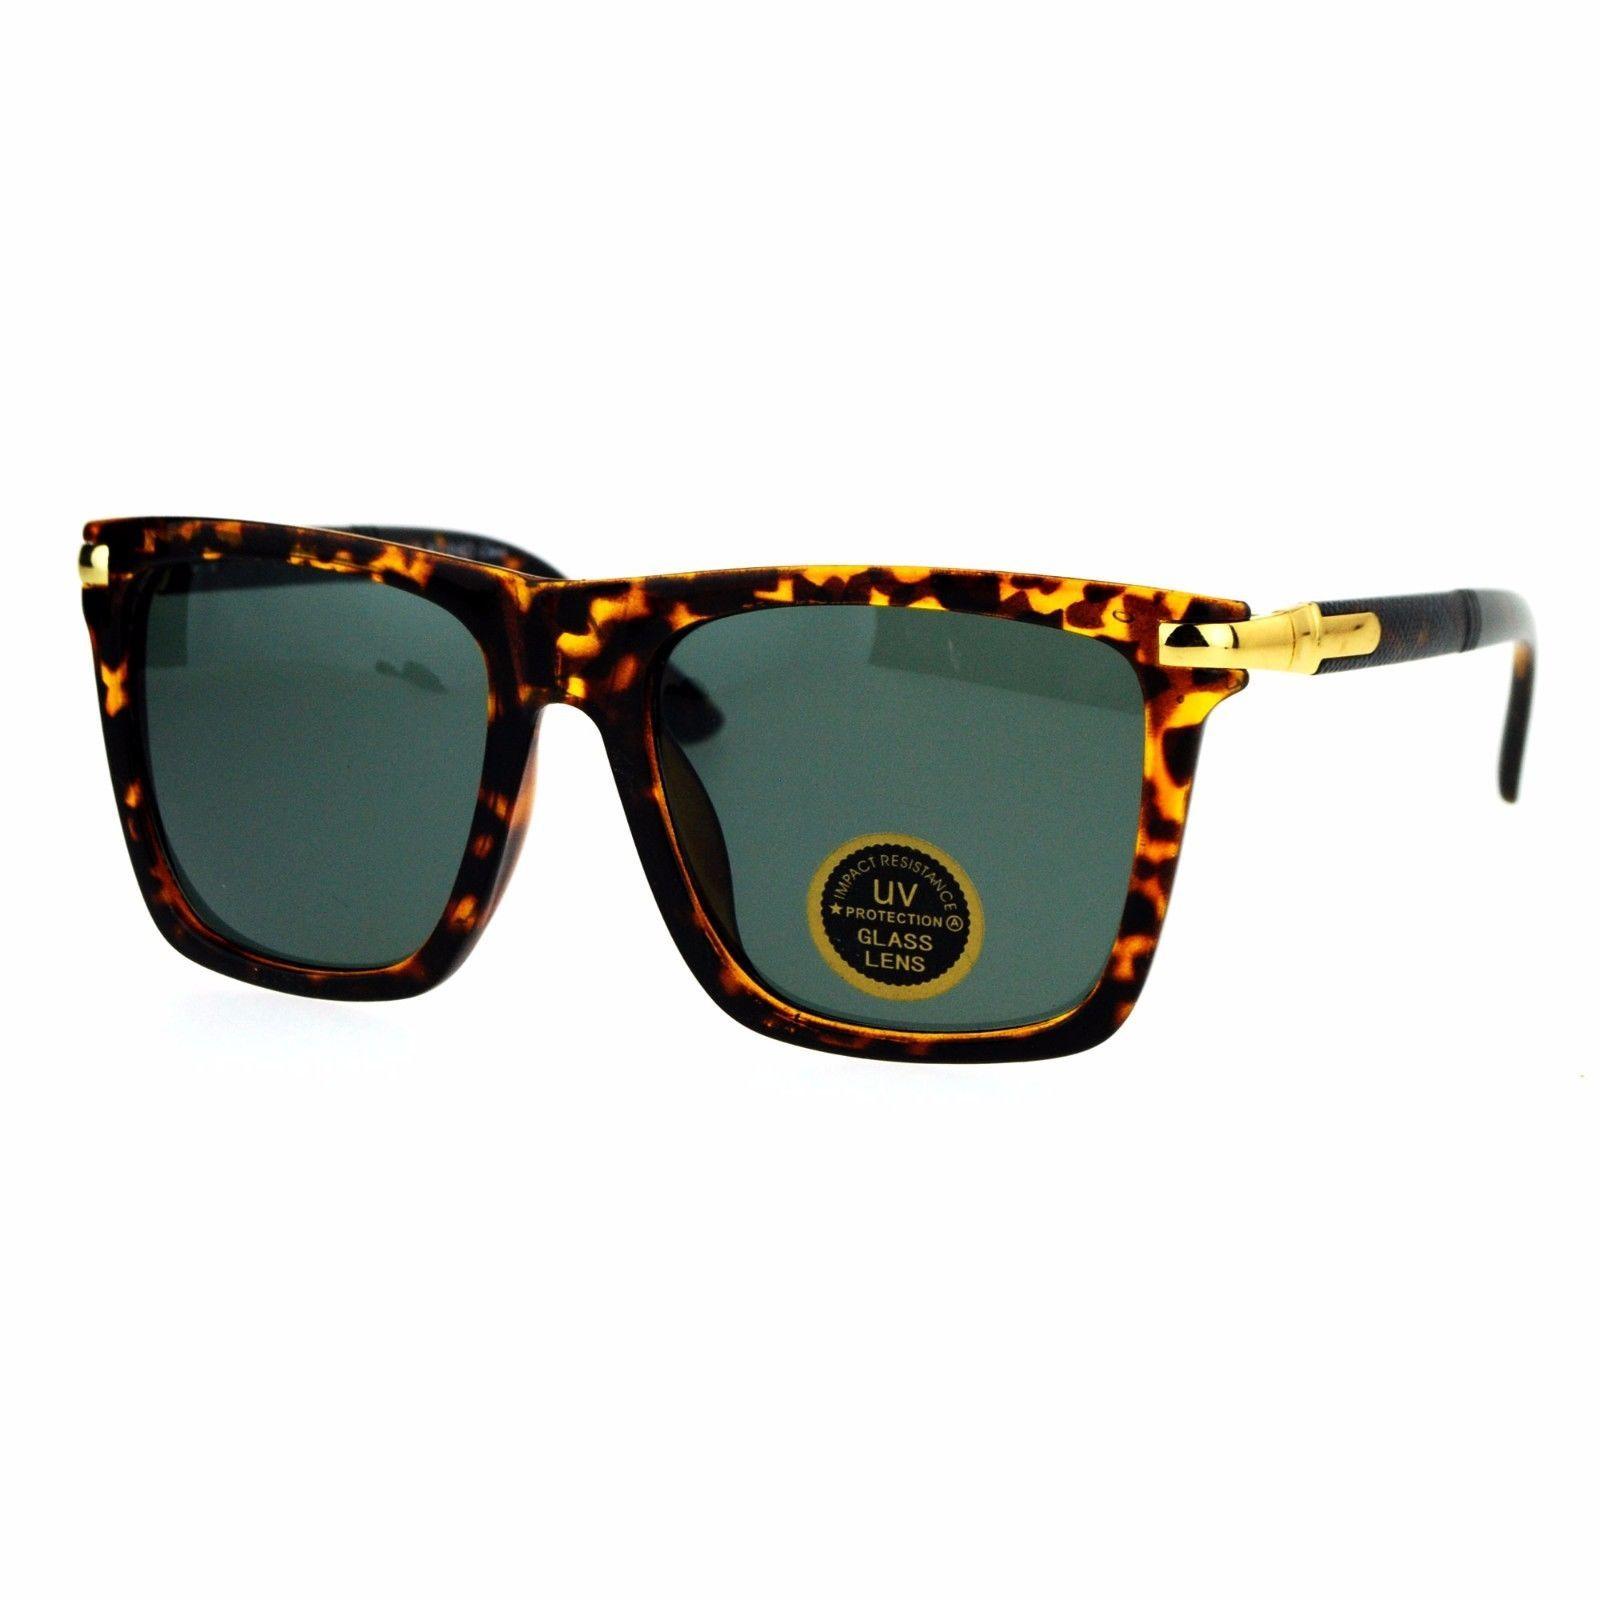 Impact Resistant Glass Lens Sunglasses Stylish Fashion Square Frame